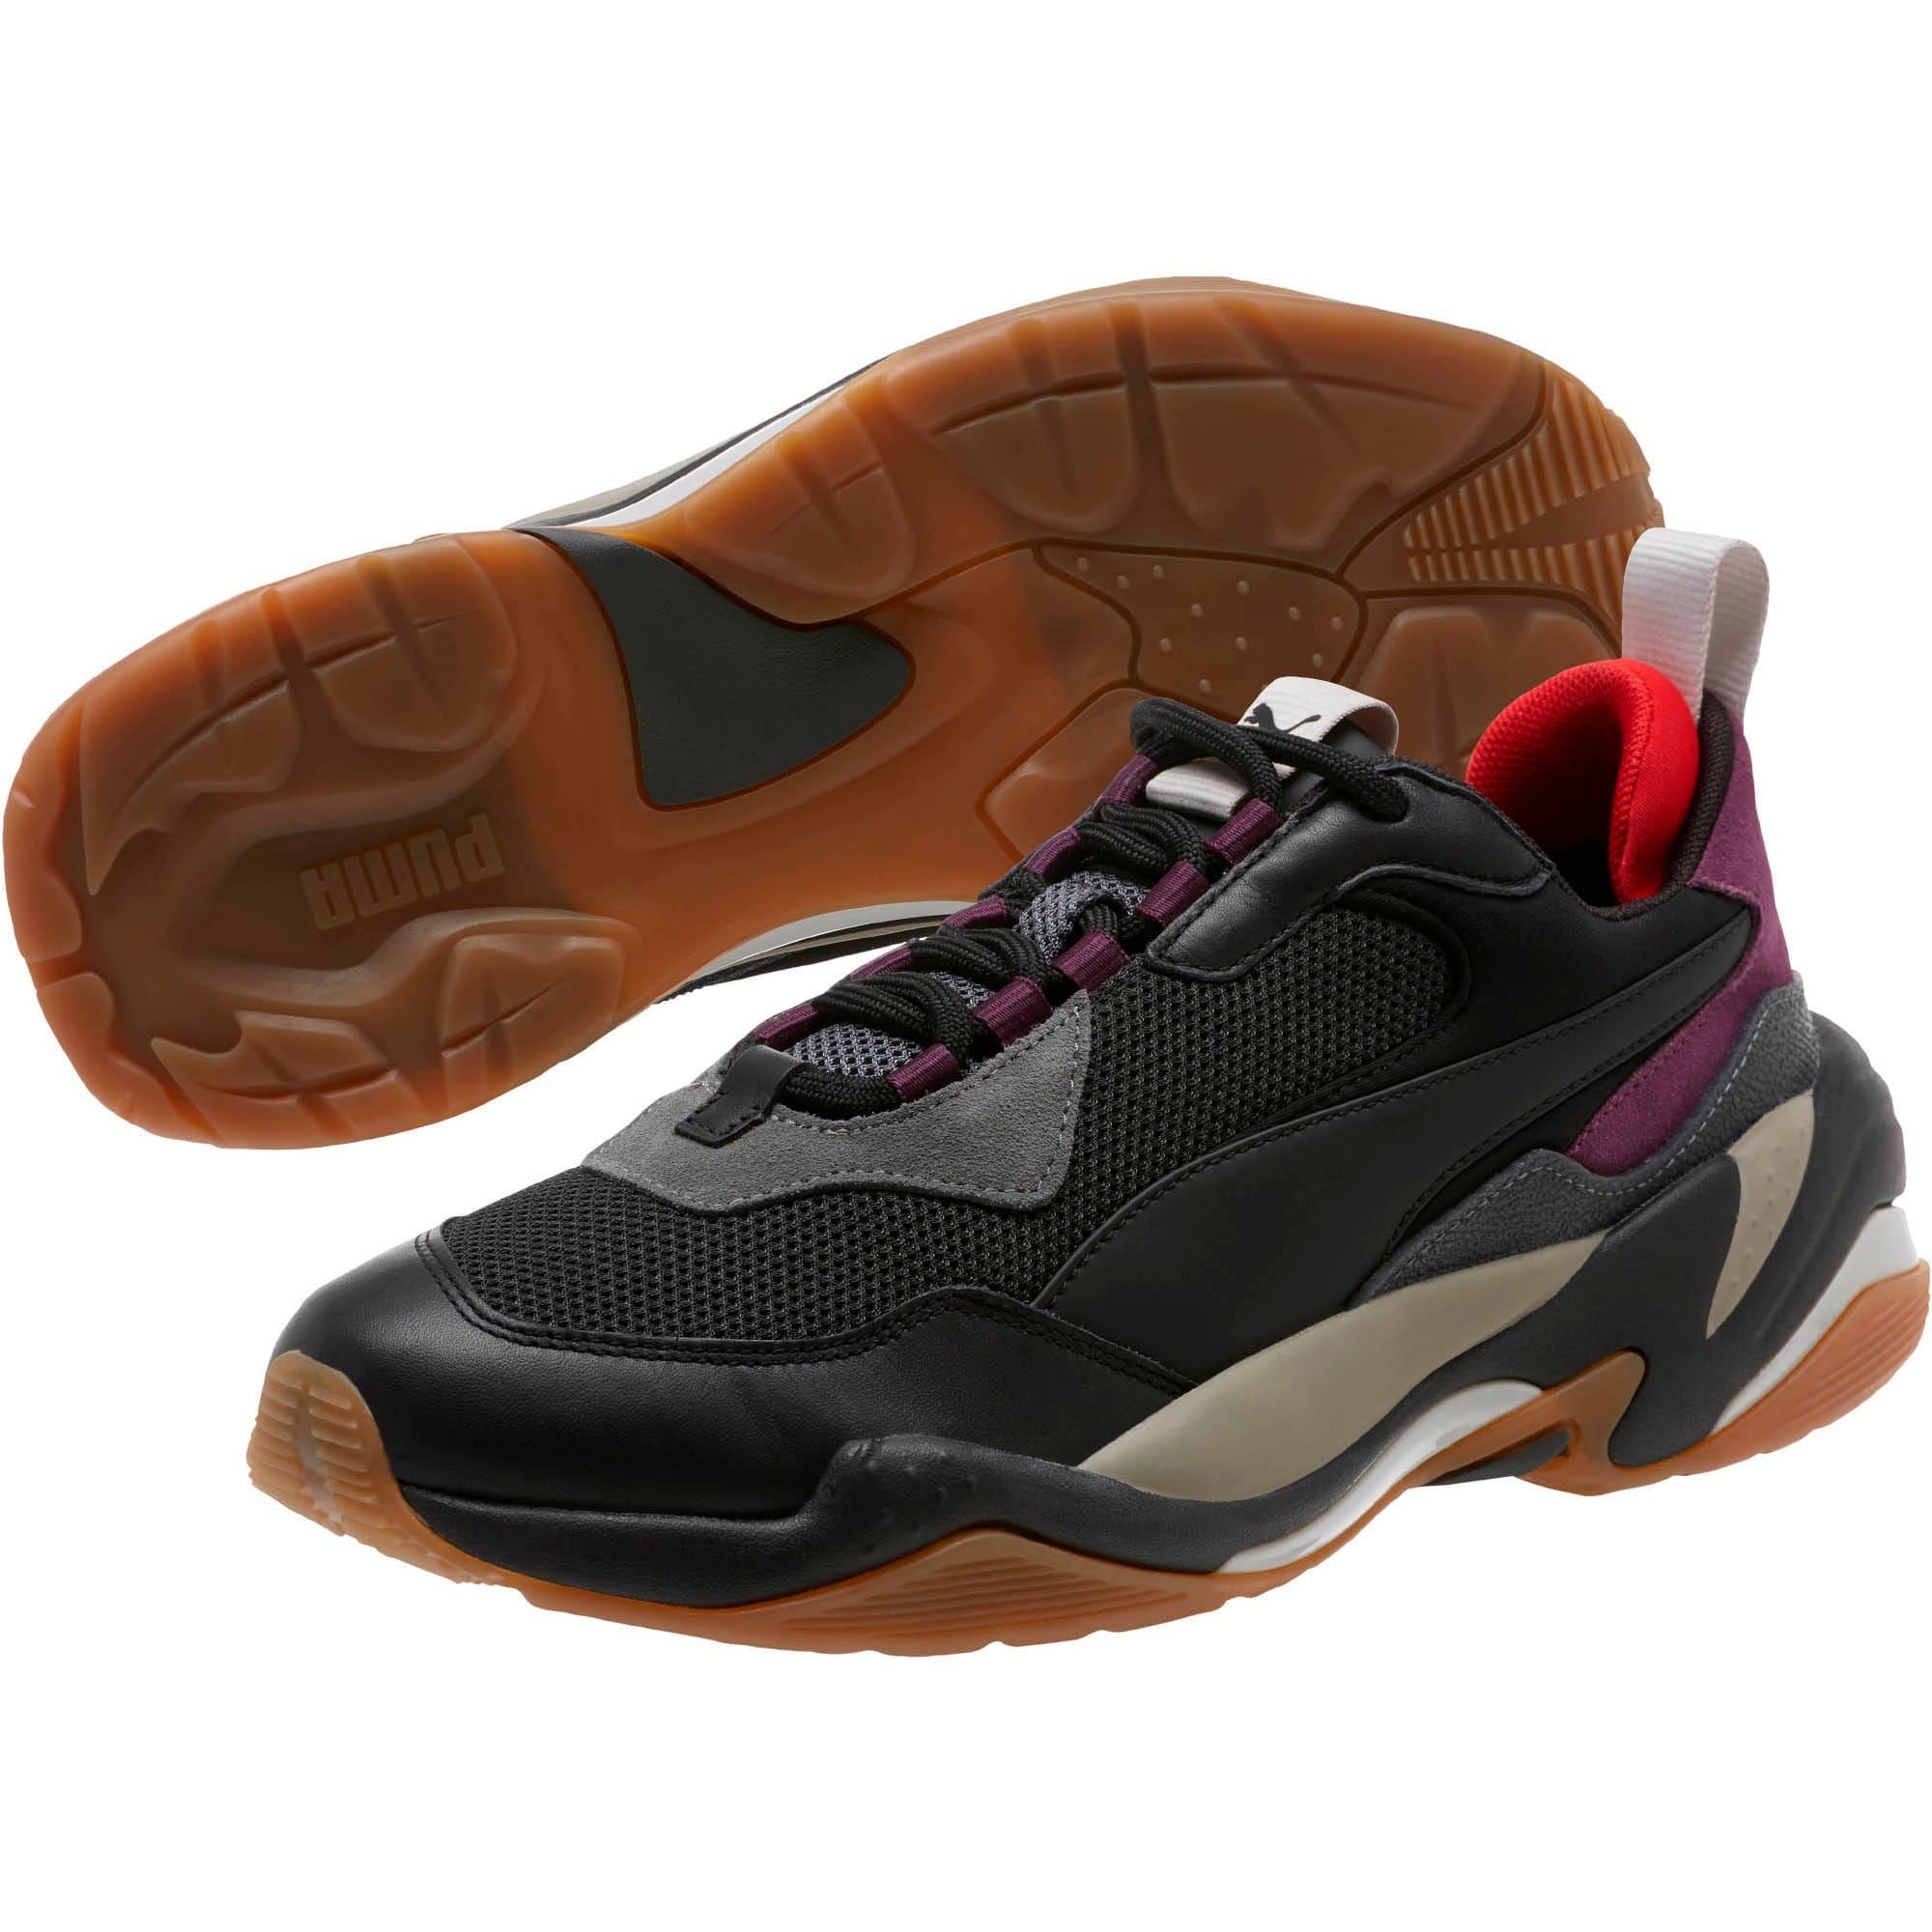 Thumbnail 2 of Thunder Spectra Sneakers, Puma Black, medium